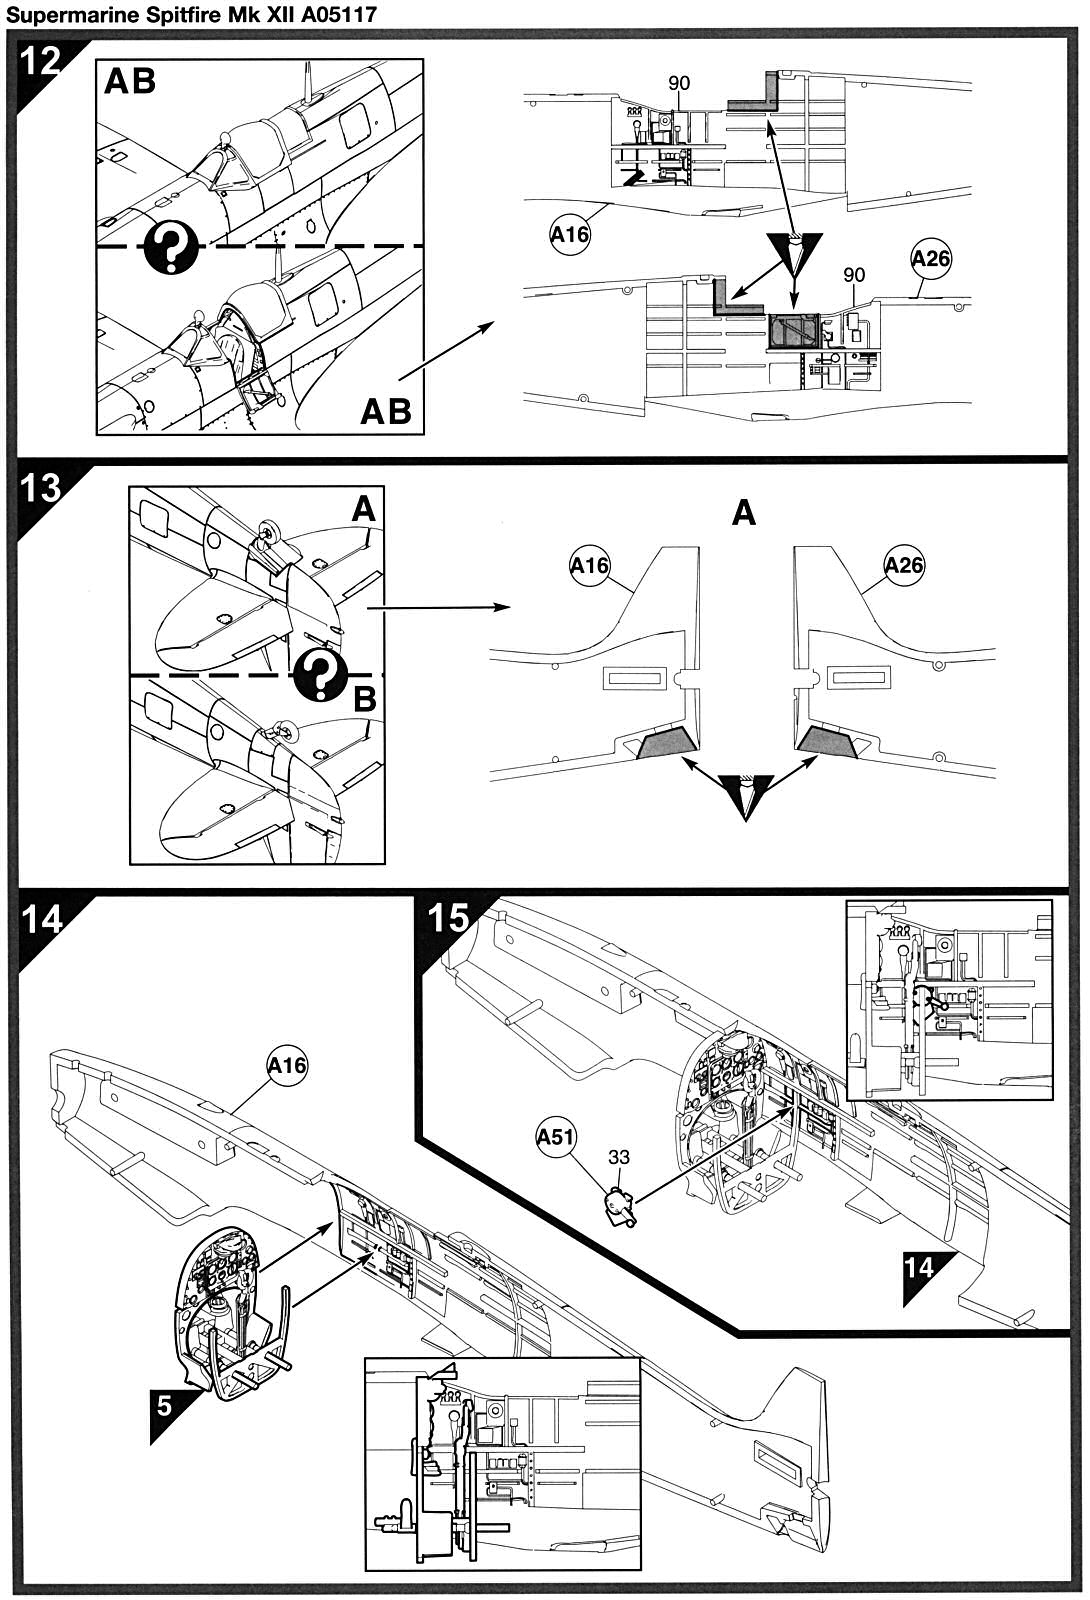 airfix spitfire 1 24 instructions